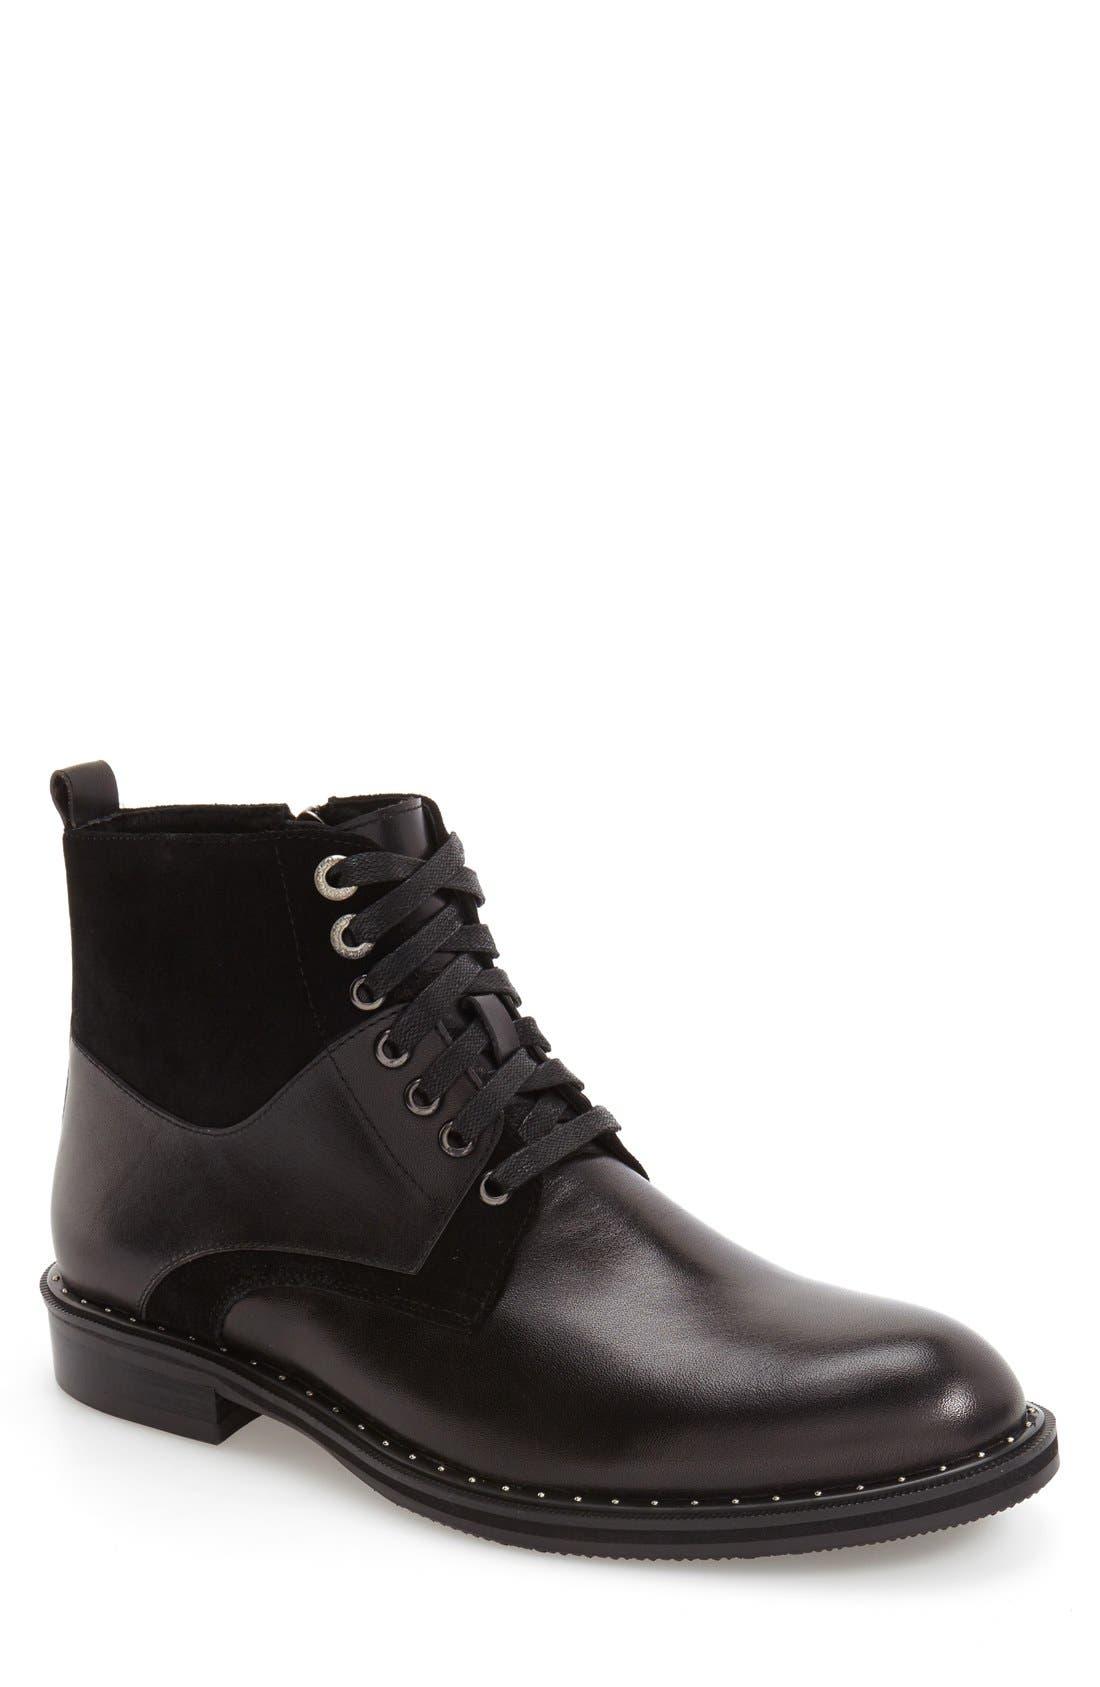 'Verona' Midi Studded Boot,                             Main thumbnail 1, color,                             Black